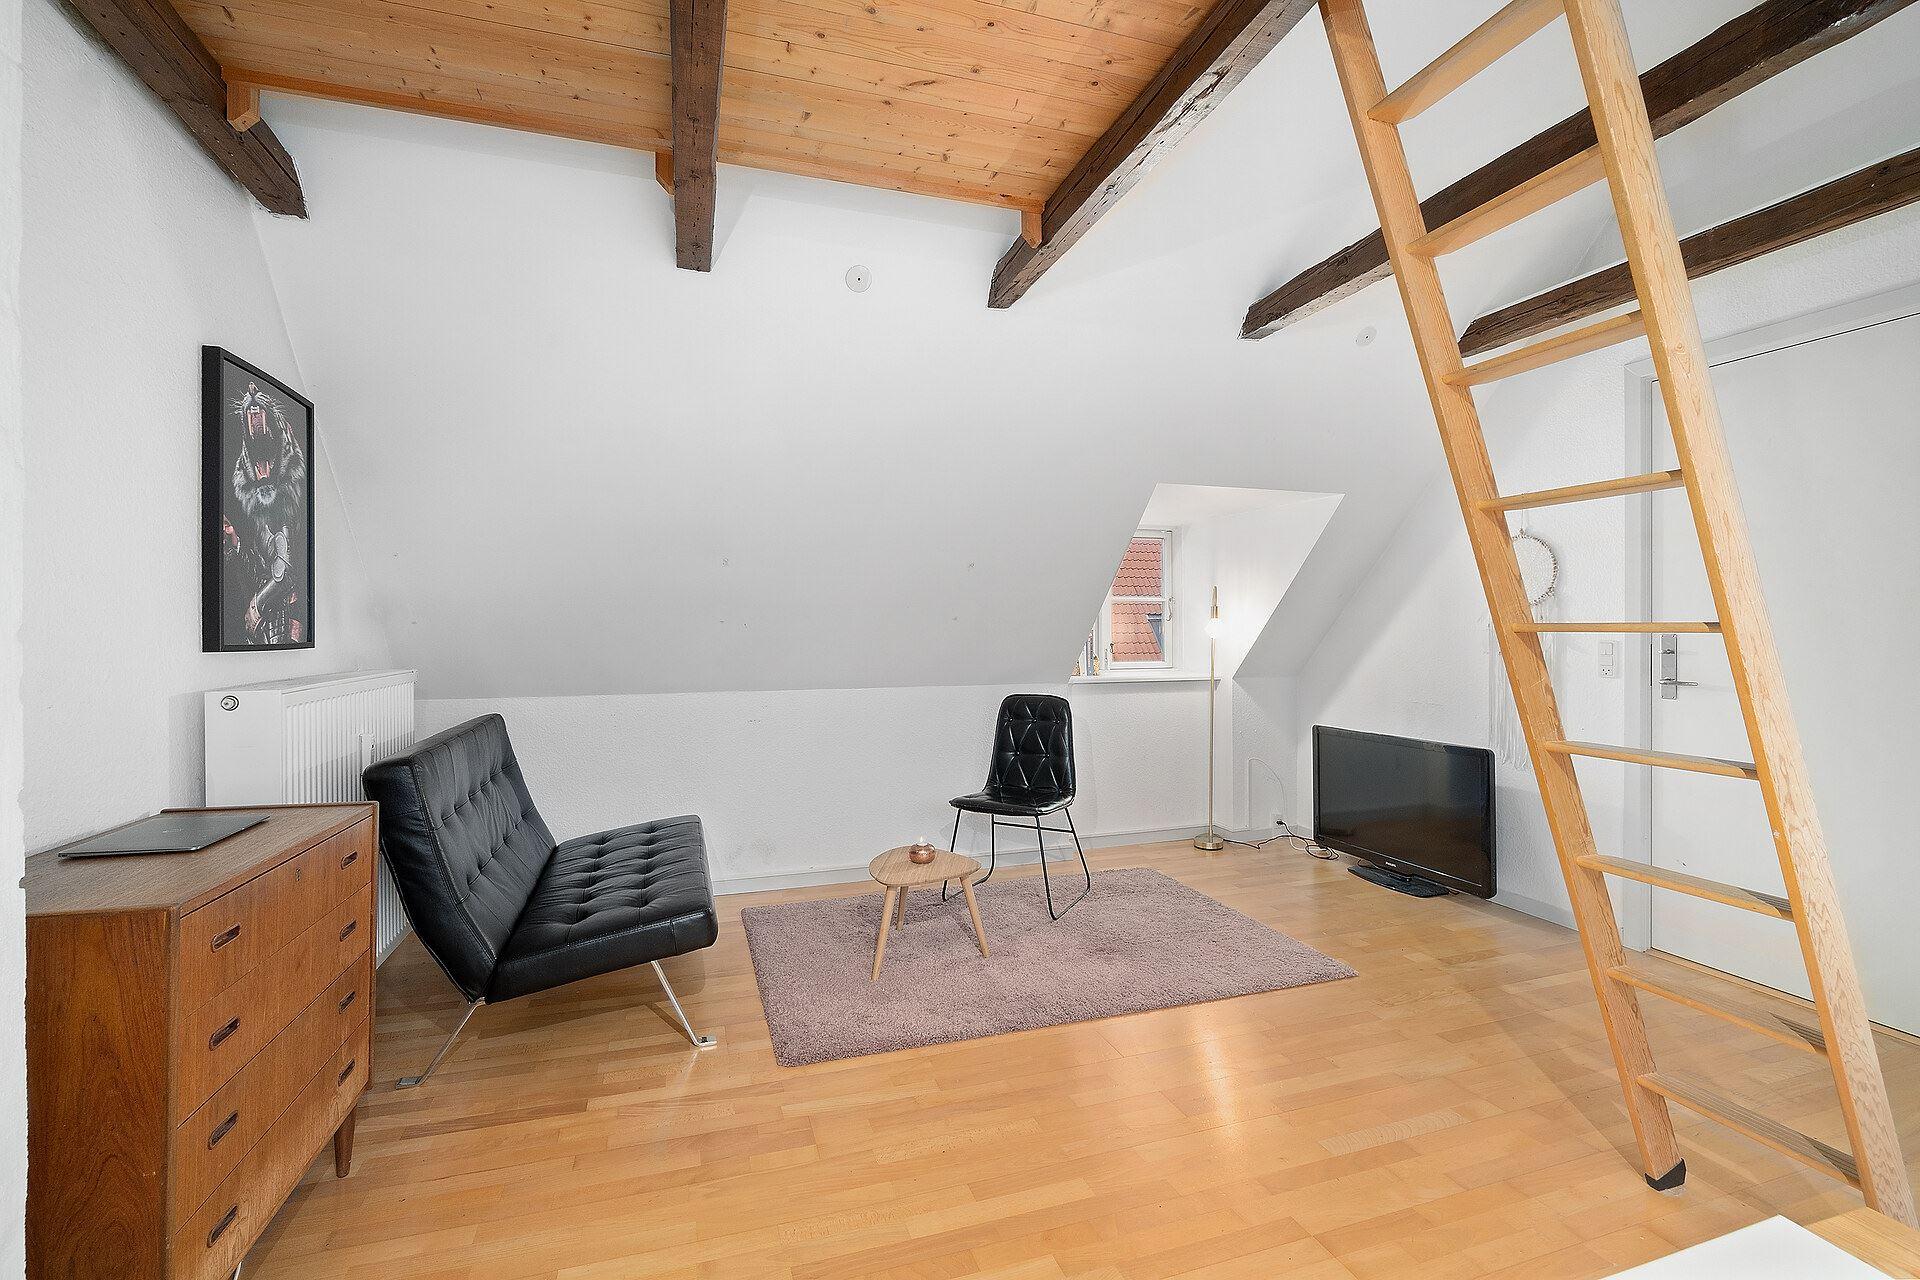 Eckersbergsgade 33 2 th, 8000 Aarhus C